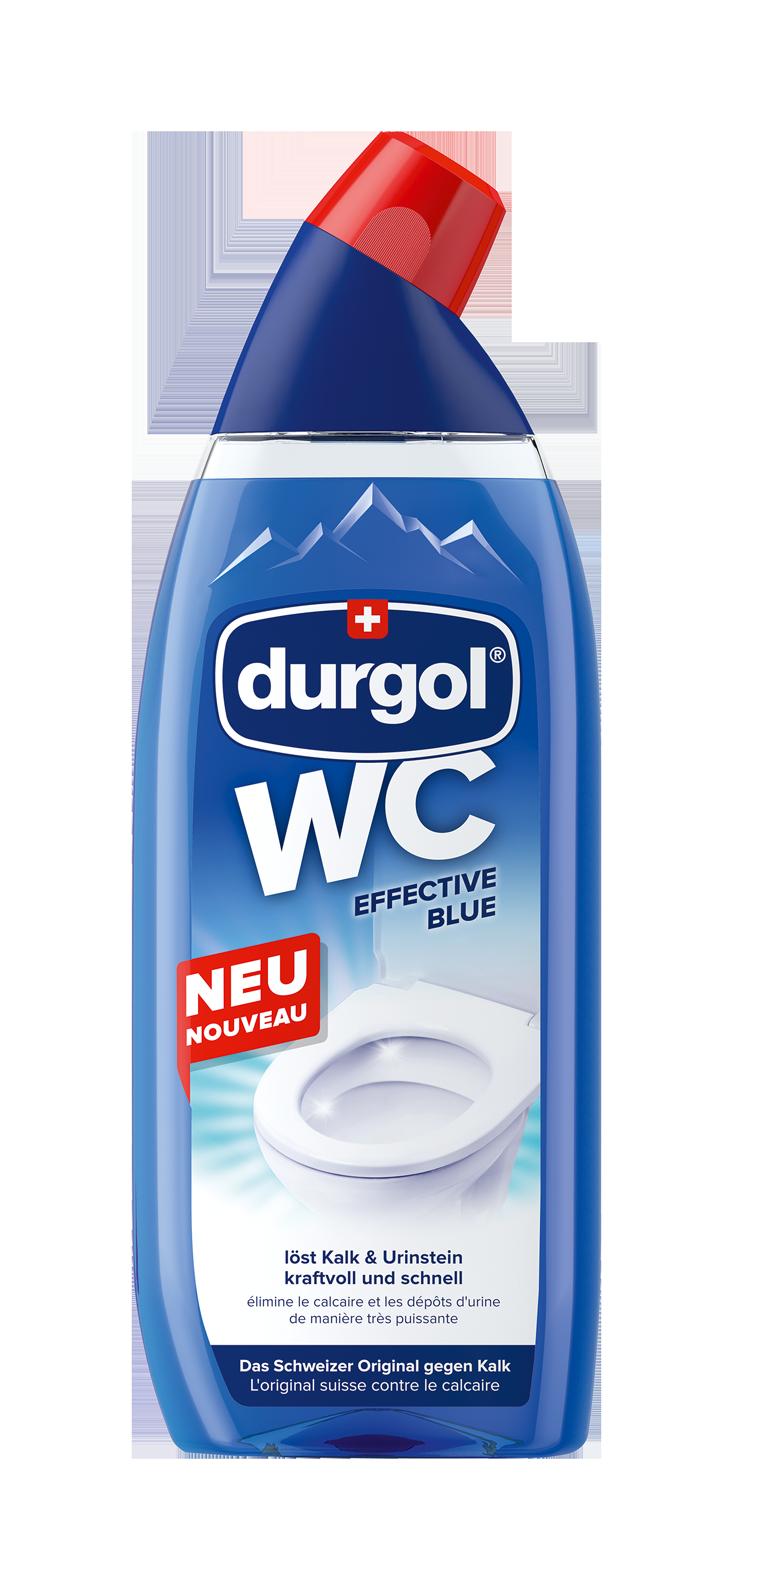 durgol WC Effective Blue